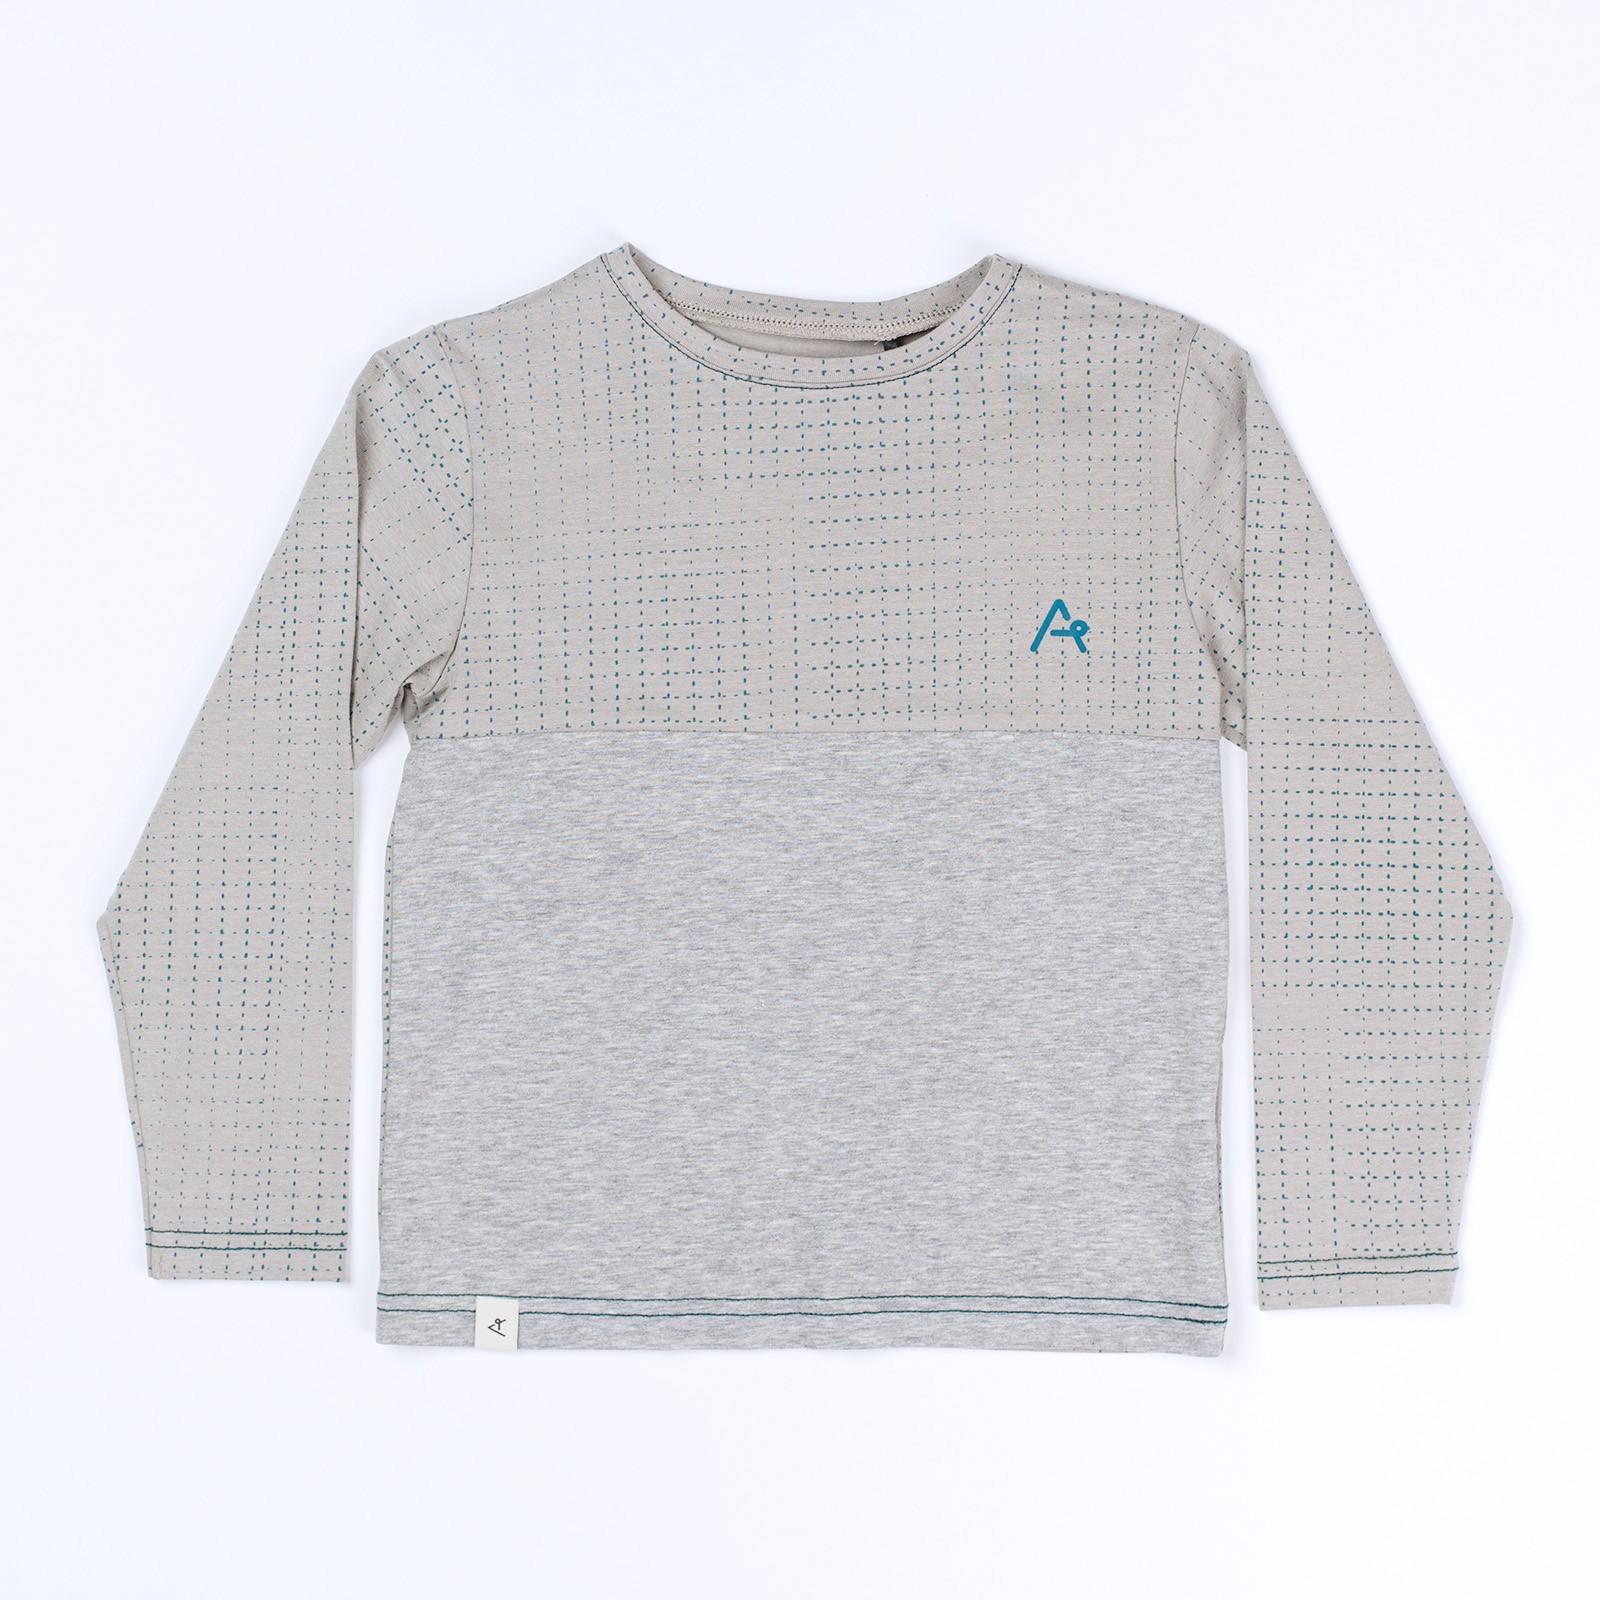 Mikkel blouse